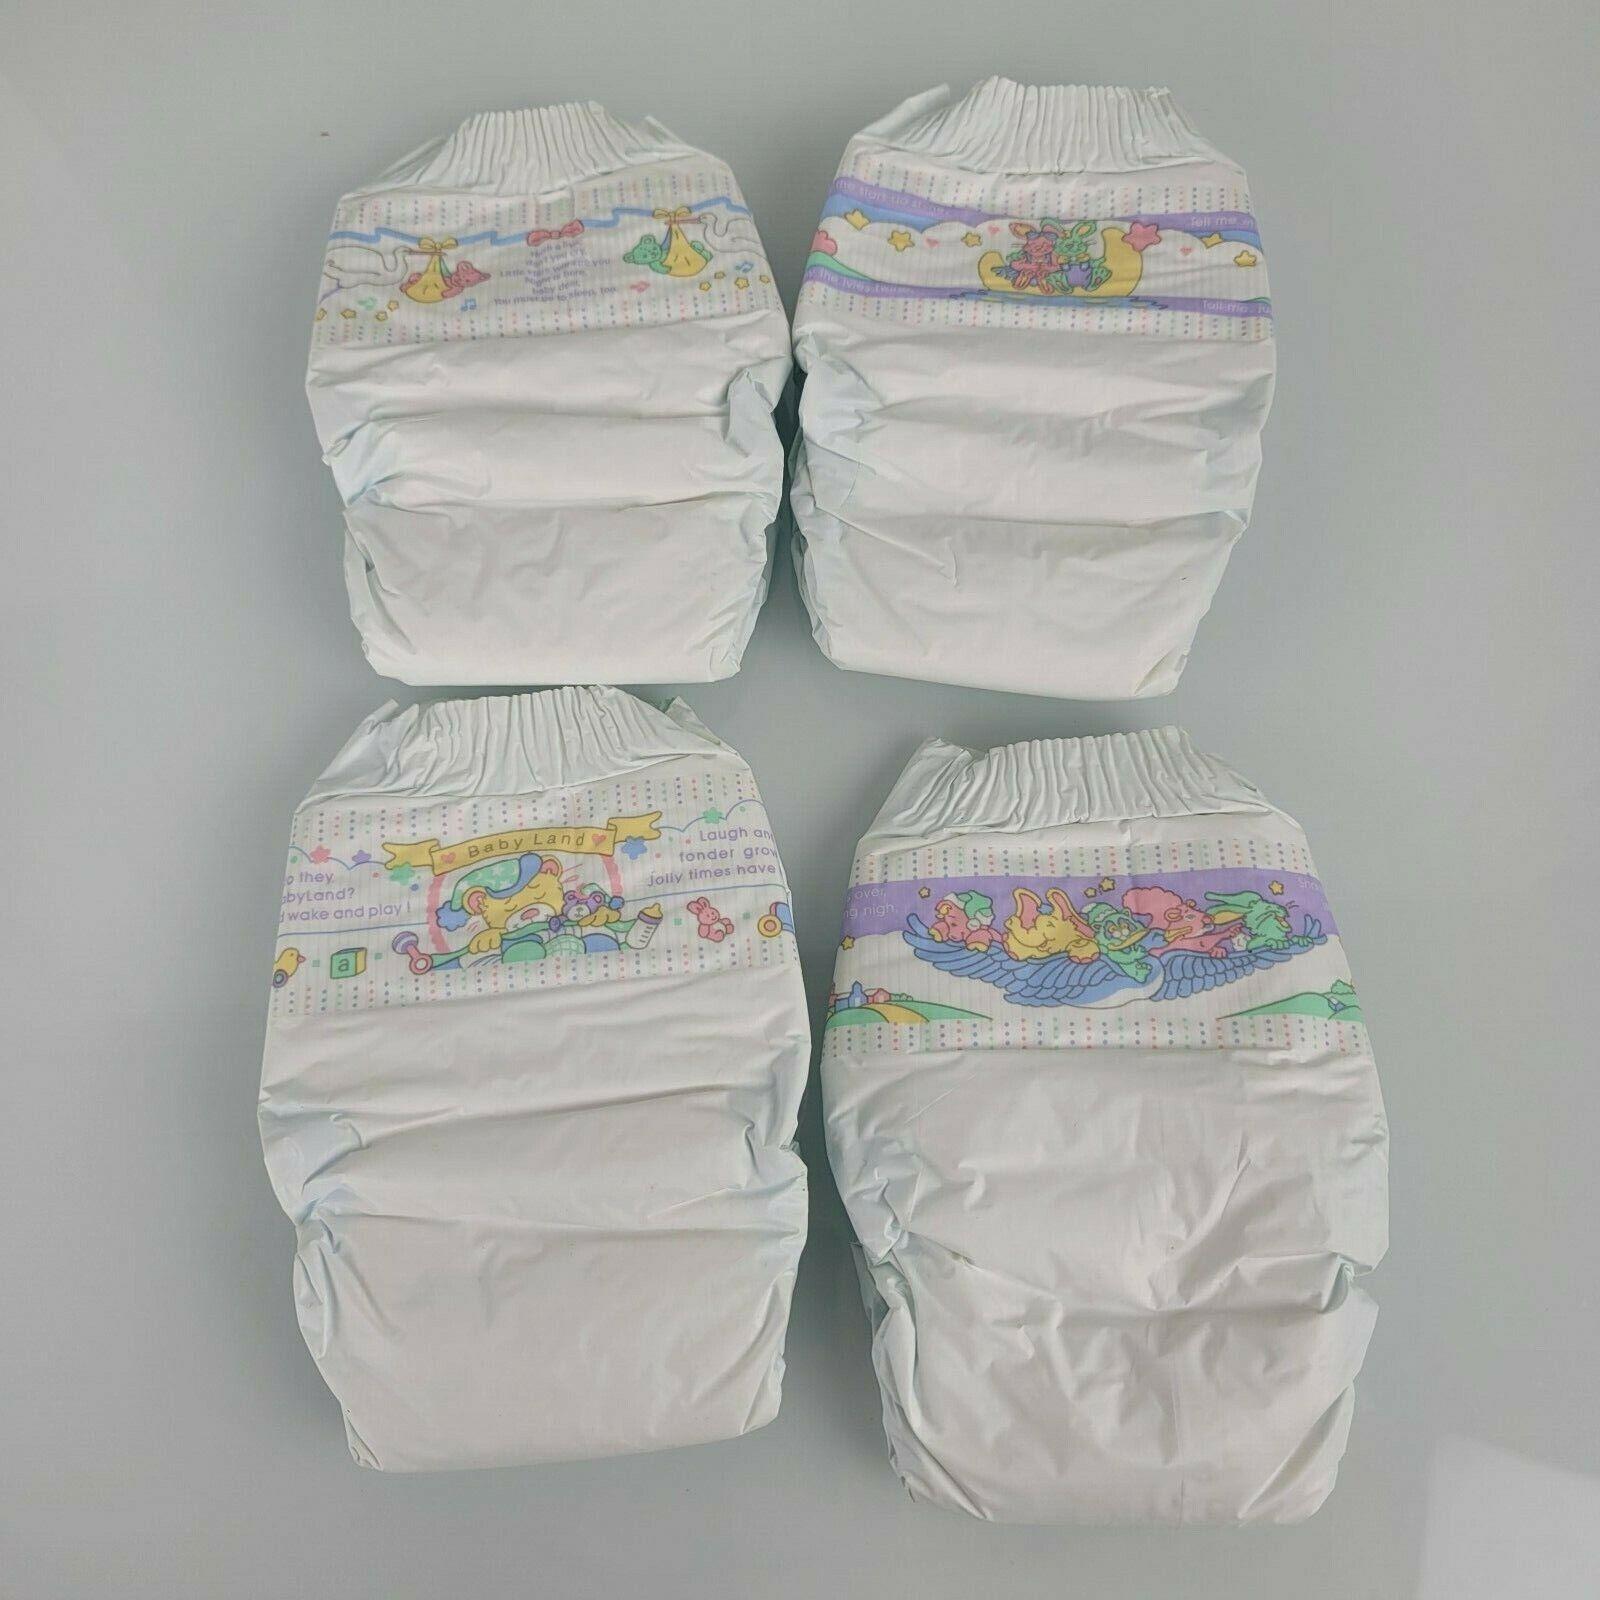 Vintage Huggies Baby Steps Size 1 1991 Plastic Diapers set o